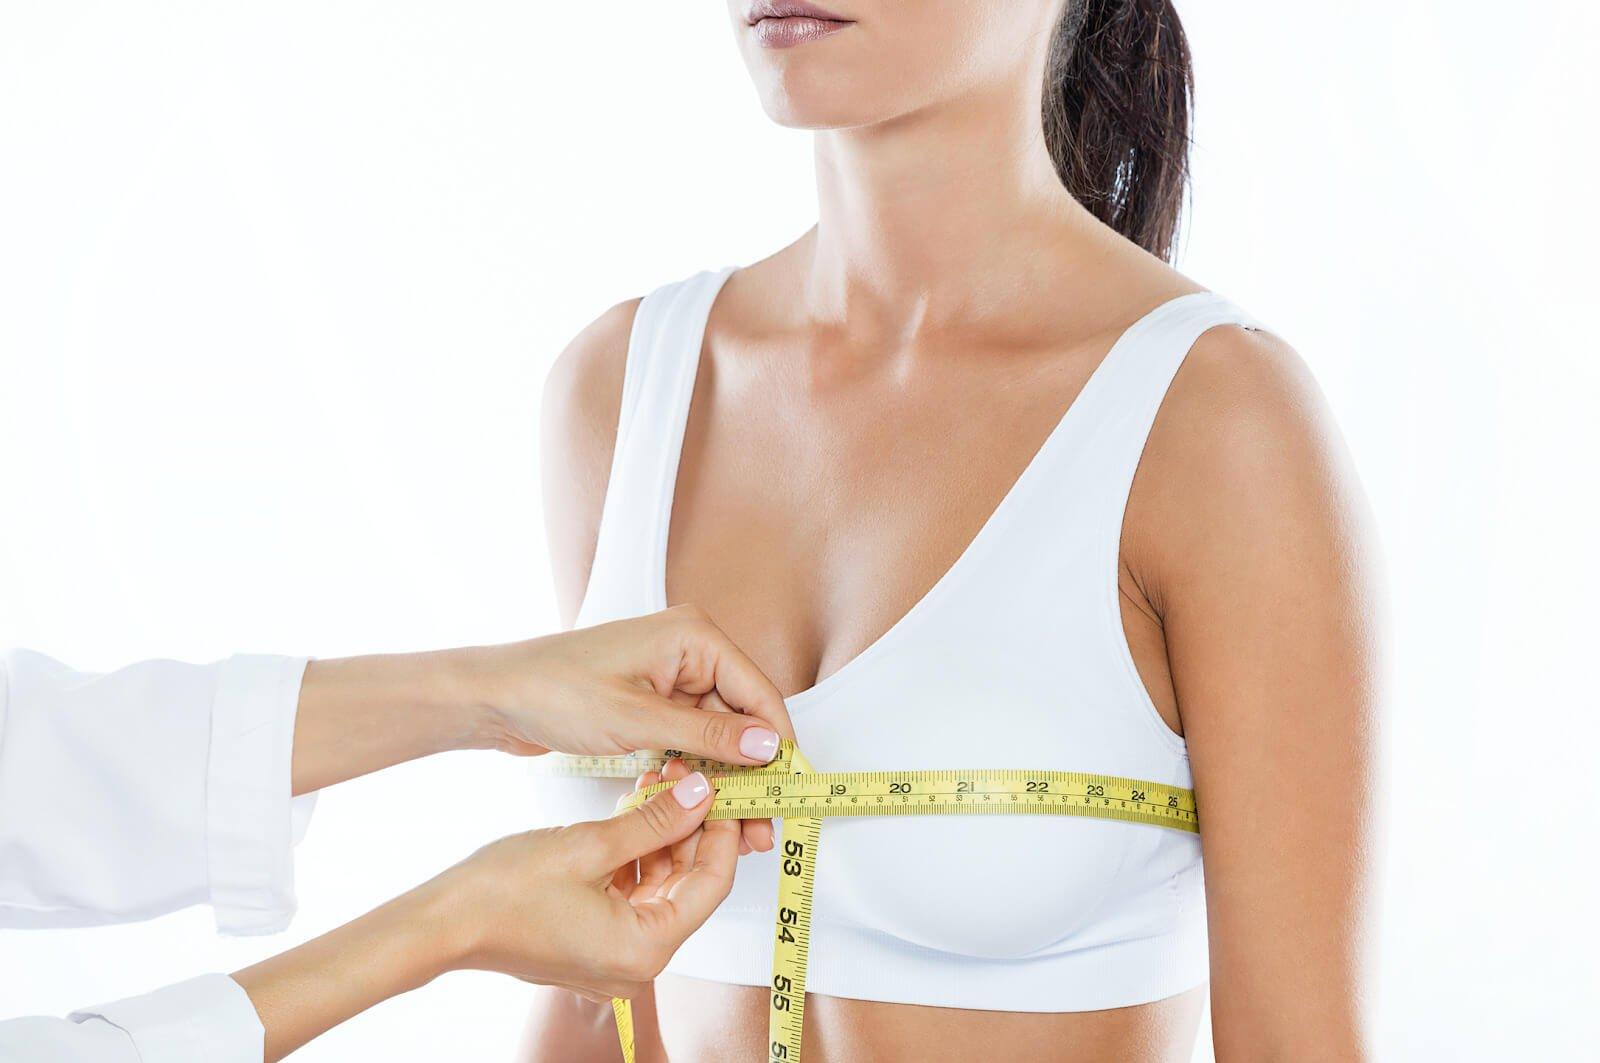 woman having her breasts measured